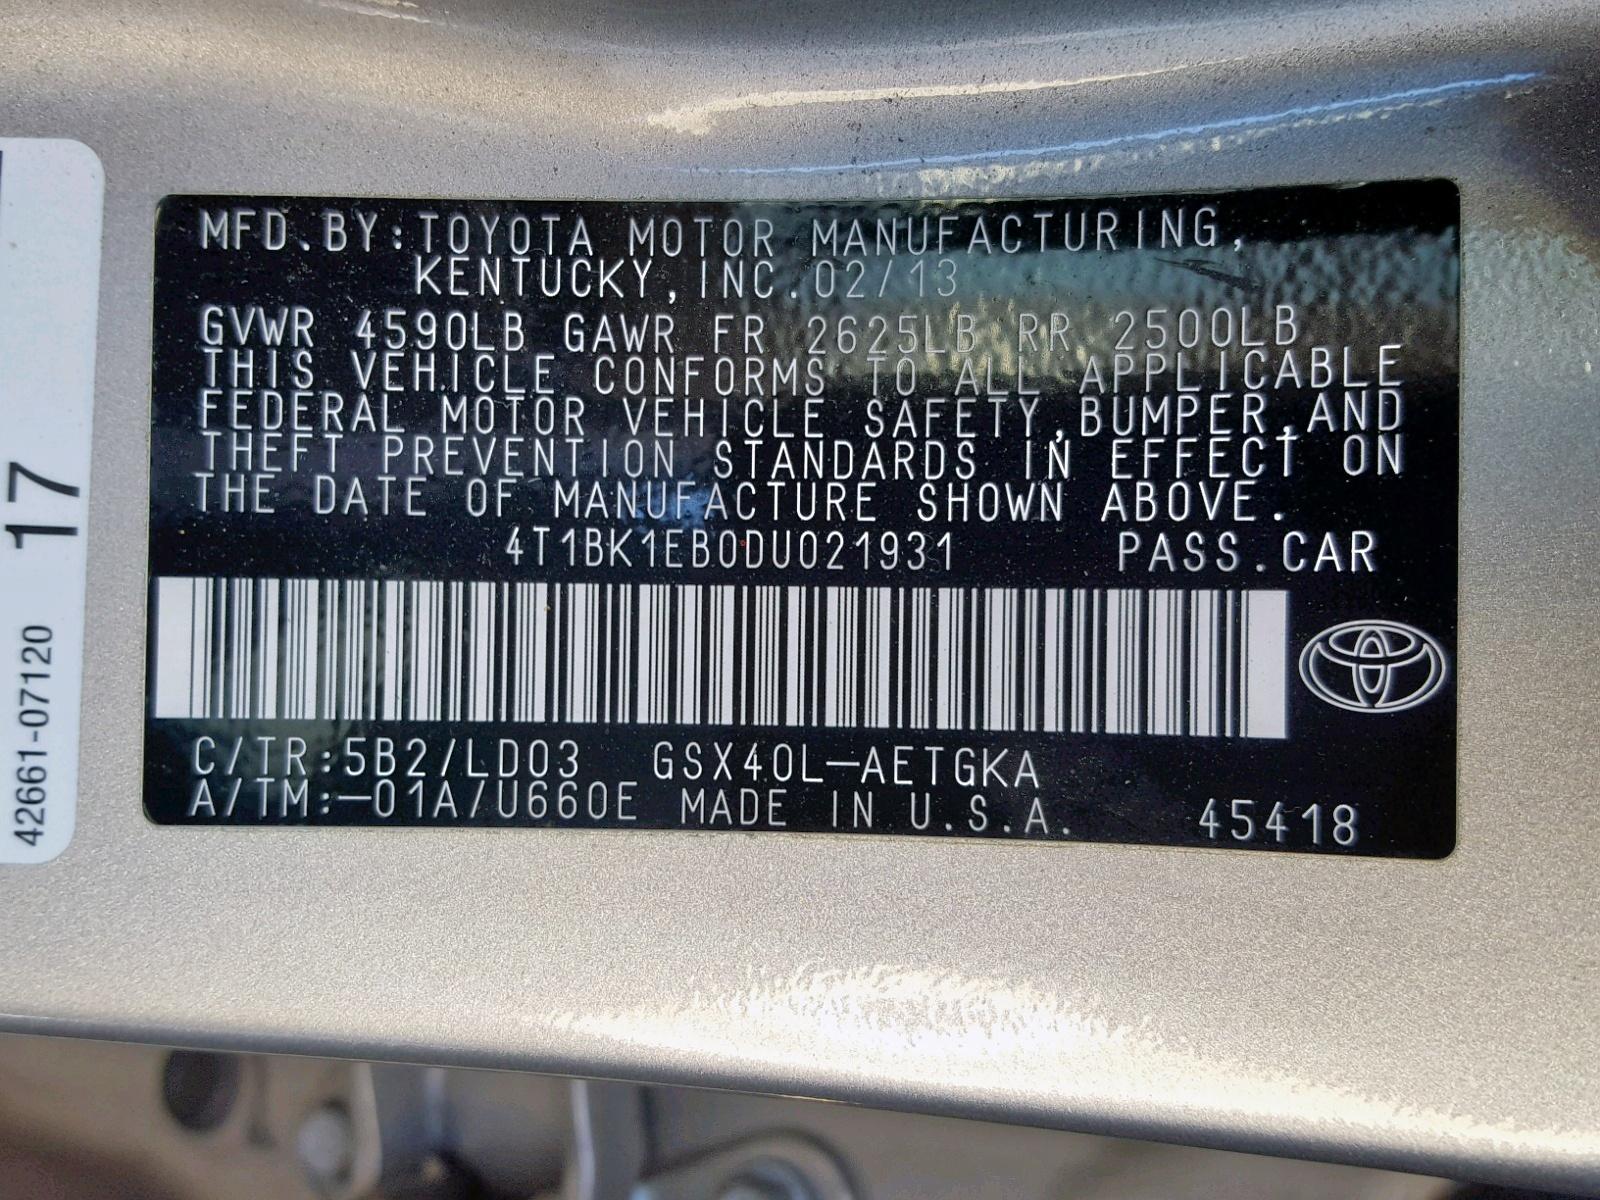 4T1BK1EB0DU021931 - 2013 Toyota Avalon Bas 3.5L